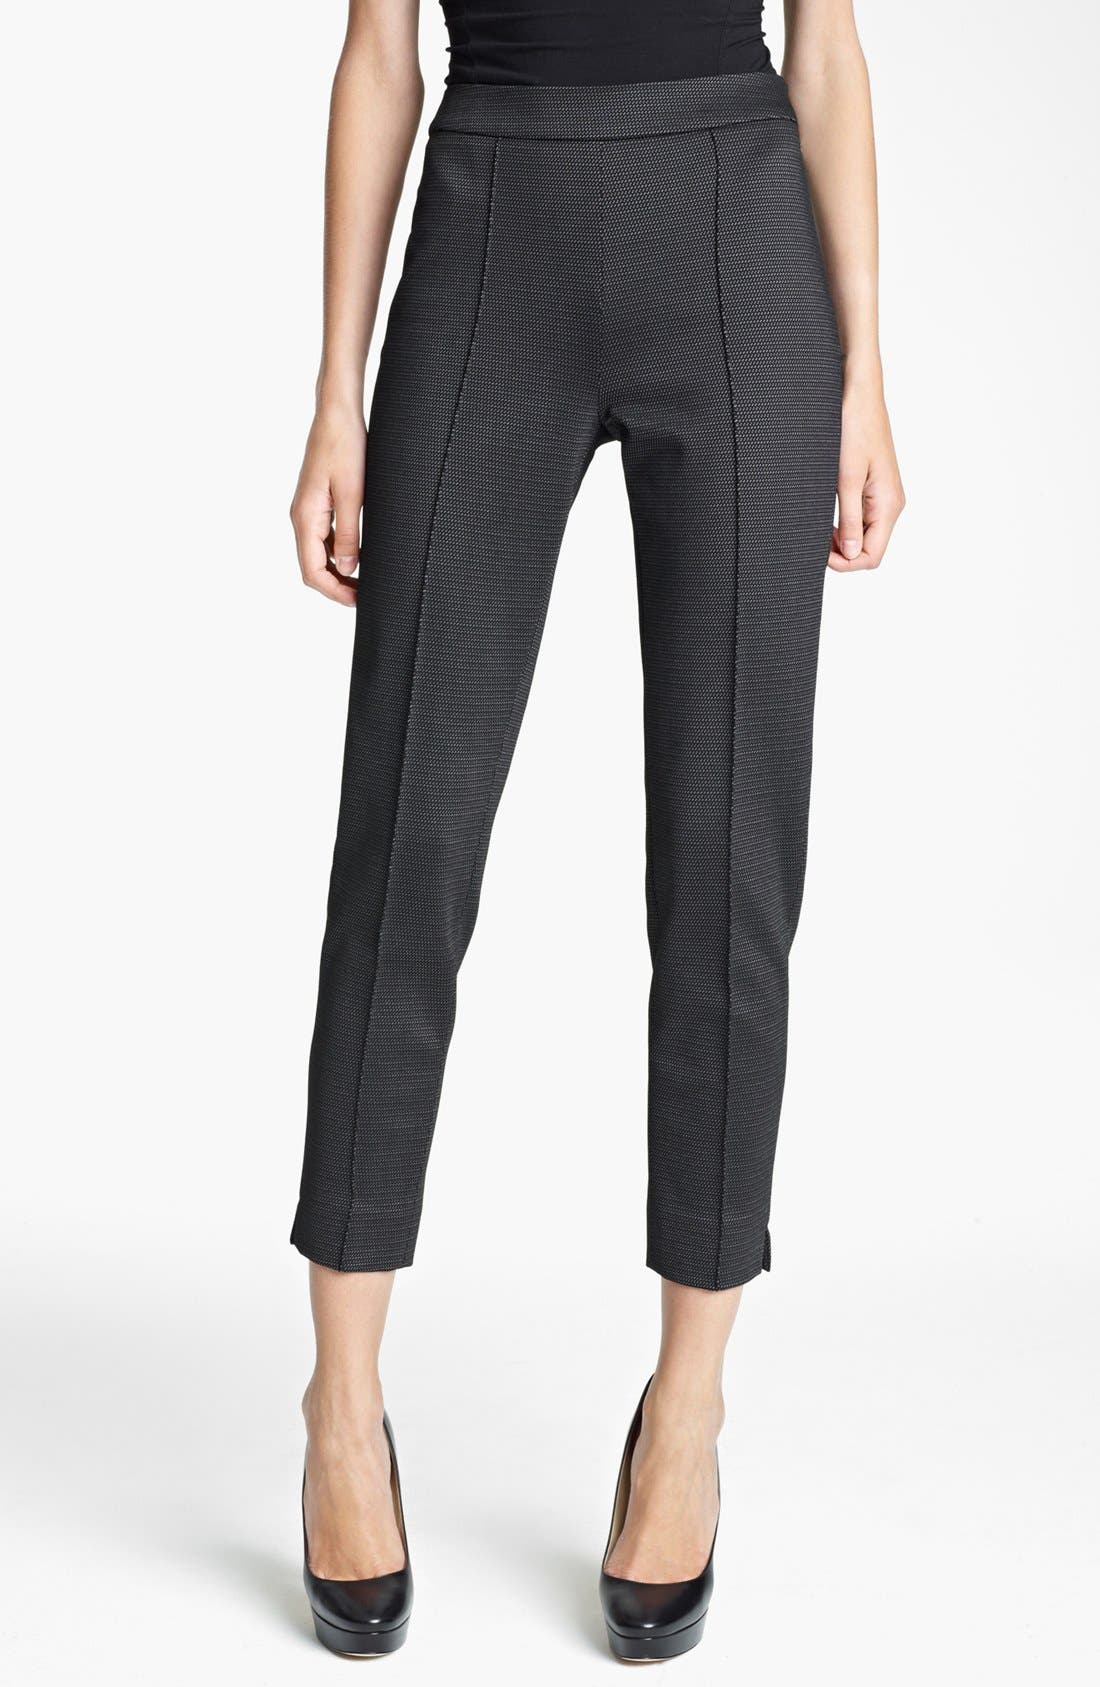 Alternate Image 1 Selected - Max Mara 'Valdorf' Print Jersey Pants